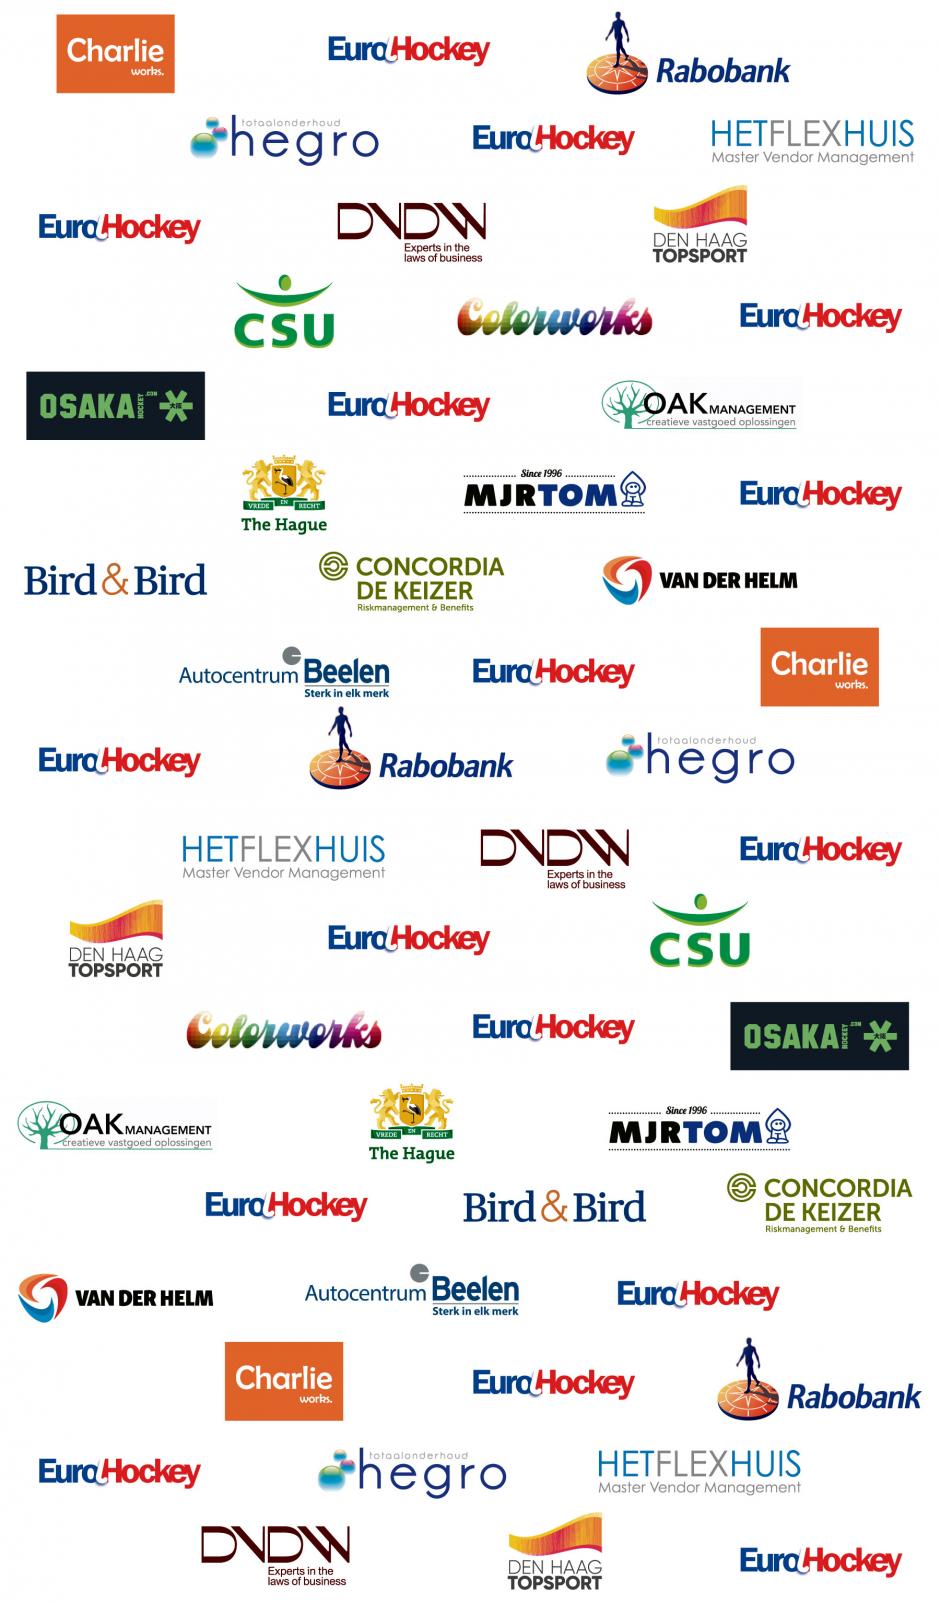 sponsor_banier_eurohockey_2.jpg